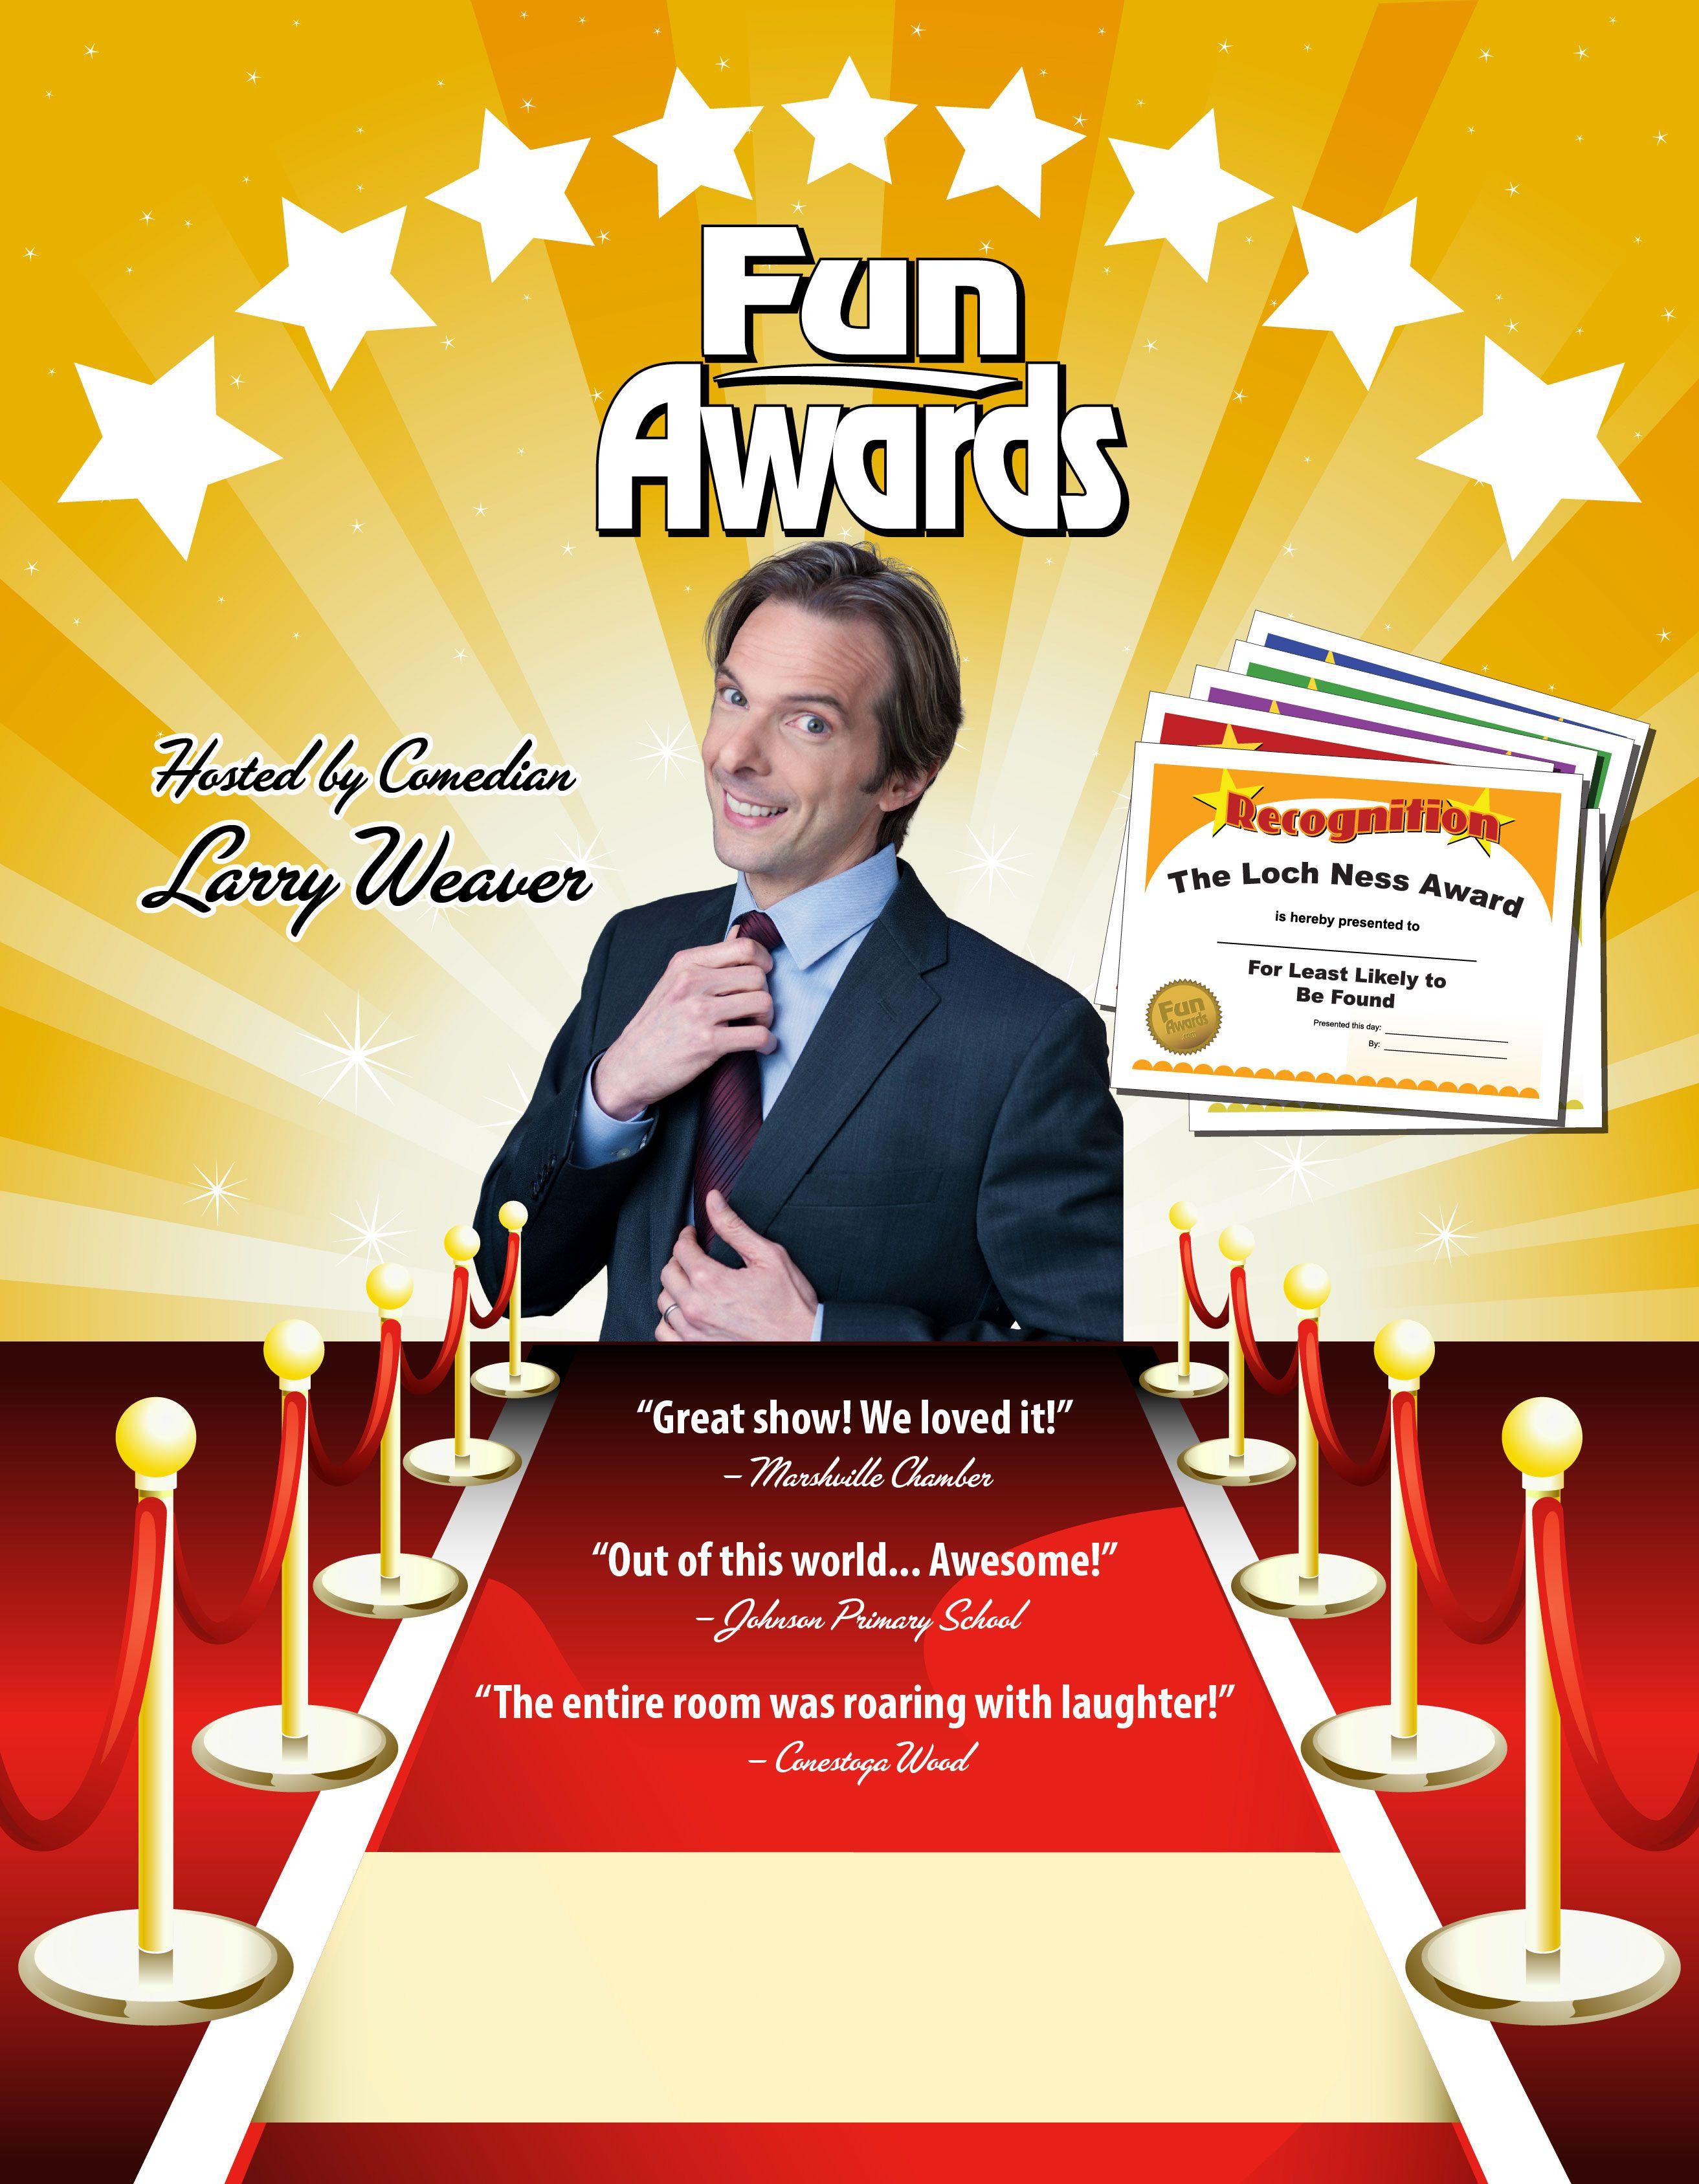 Funny Awards The Funny Employee Awards Show For Your Staff Funny Awards Funny Office Awards Funny Employee Awards